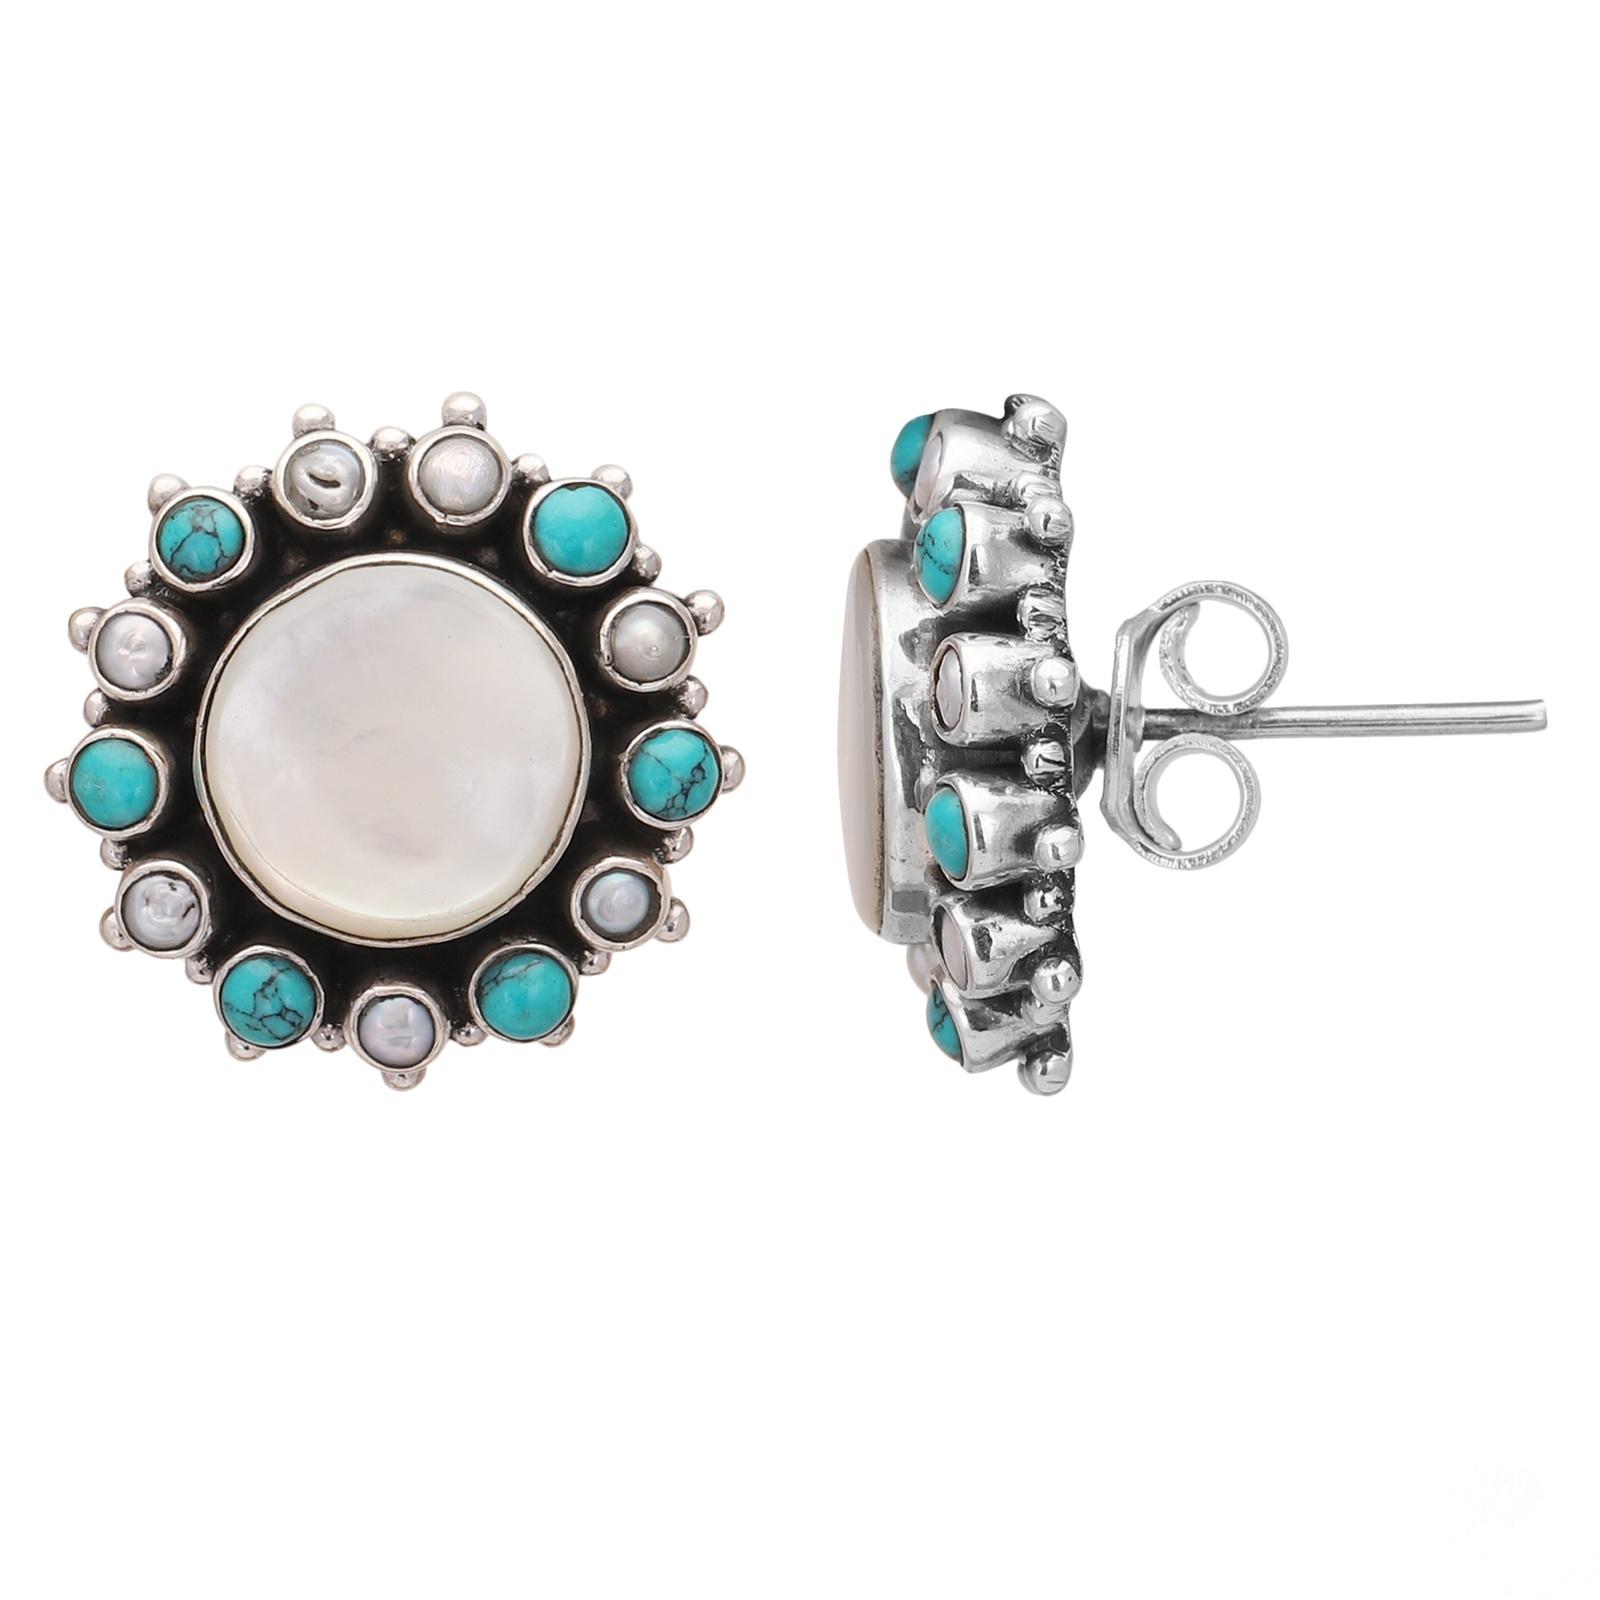 Mother of Pearl Sterling Silver Stud Earrings